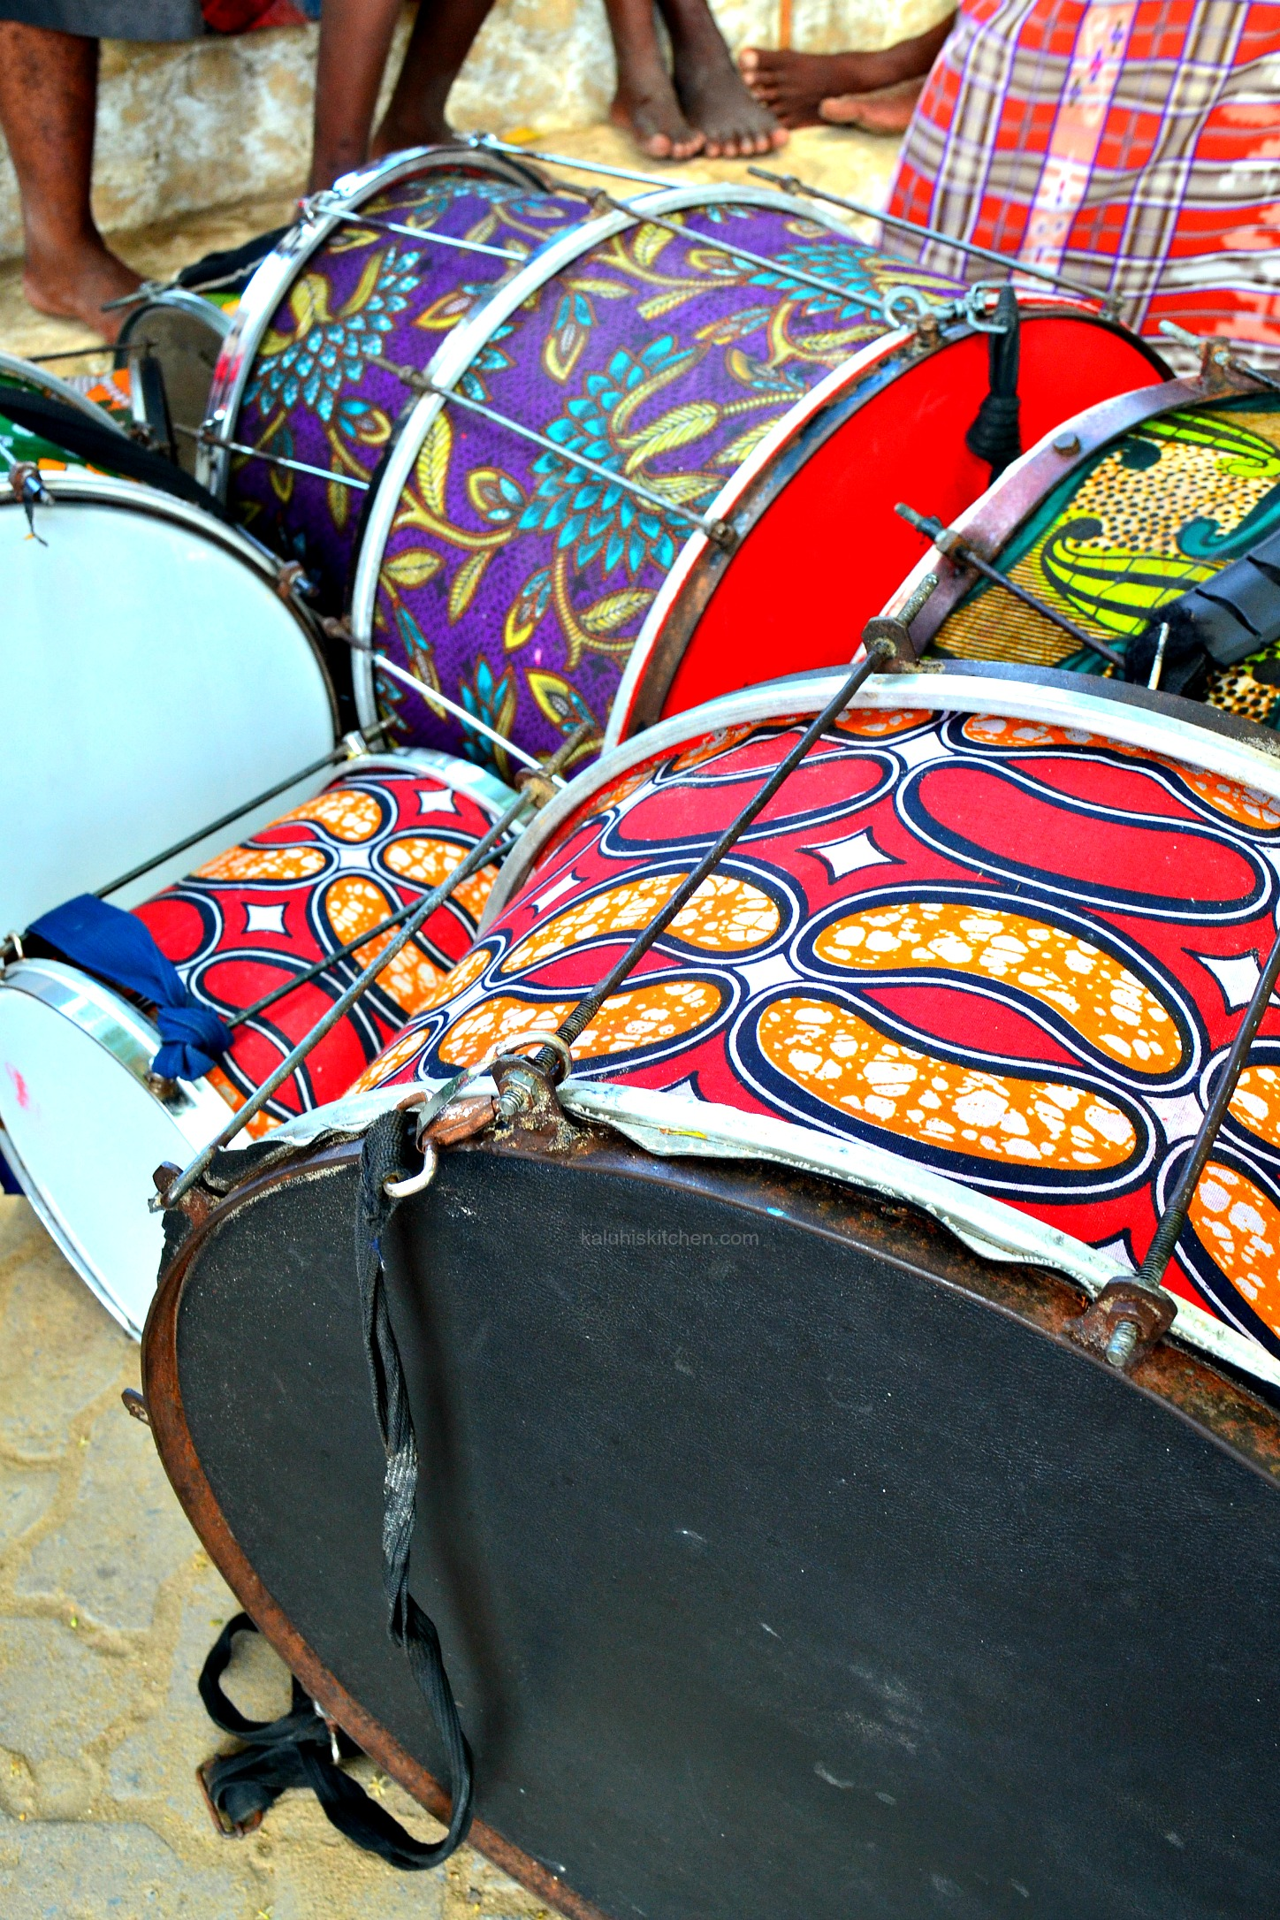 drum set common along the streats of Lmau_Kenyan culture_Lamu food festival_kaluhiskitchen.com